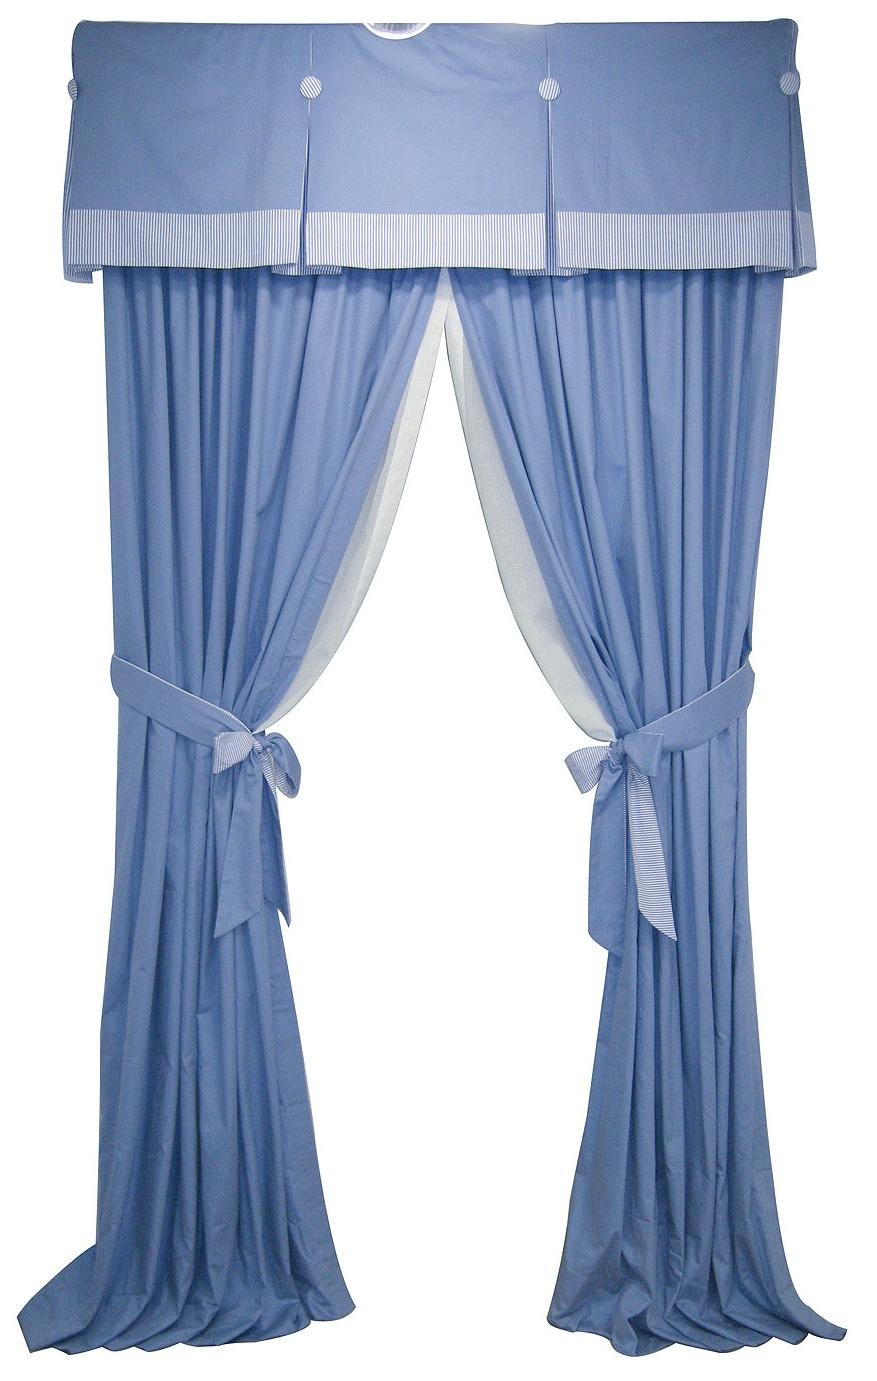 Cape cod curtains